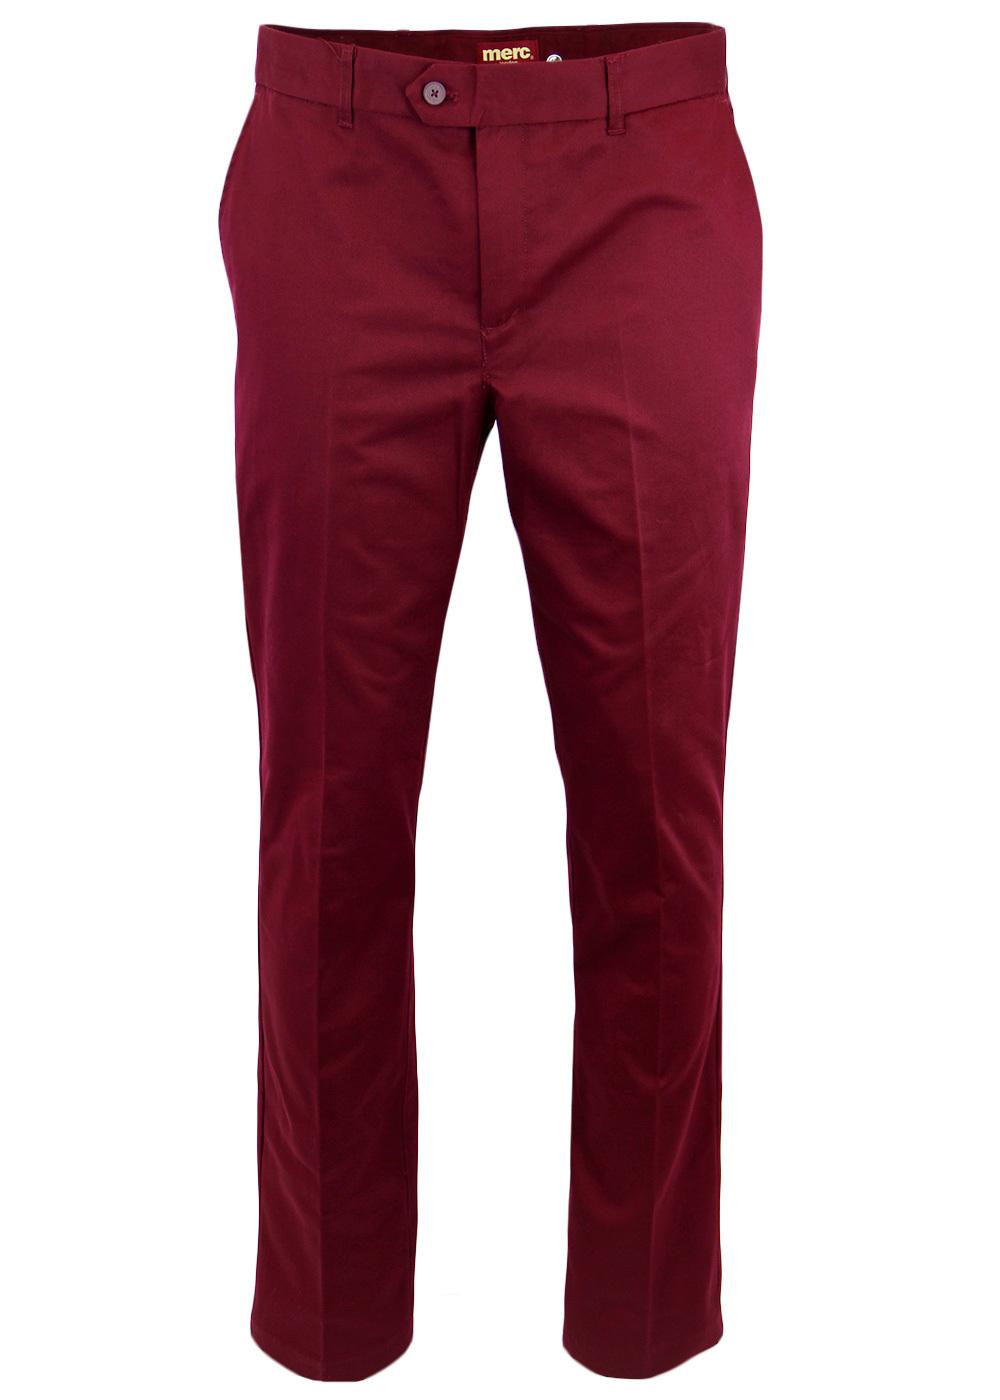 Winston MERC 60s Mod Sta Press Retro Trousers (W)